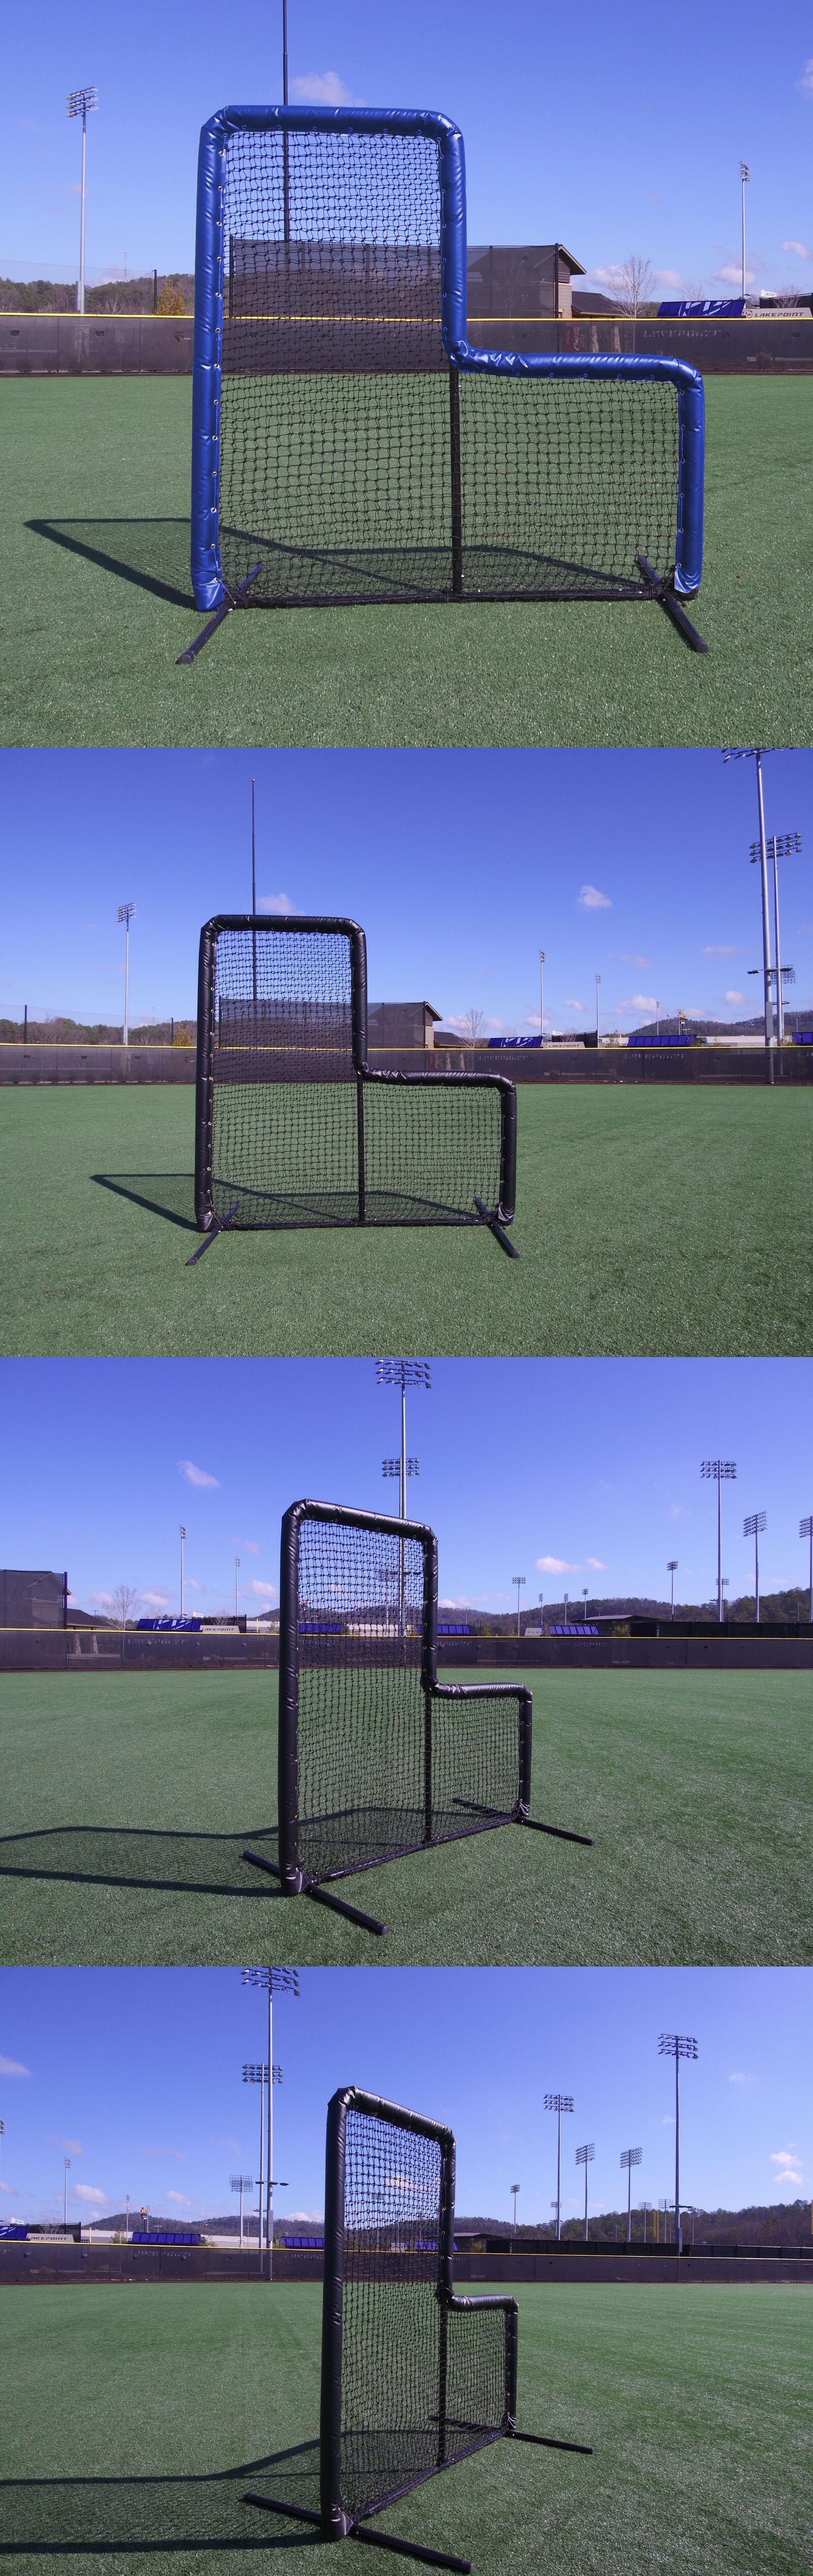 Batting Cages And Netting 50809 7 X 7 Armor Baseball Softball Pitching L Screen W Royal Vinyl Foam Padding Batting Cages Softball Pitching Baseball Pitching